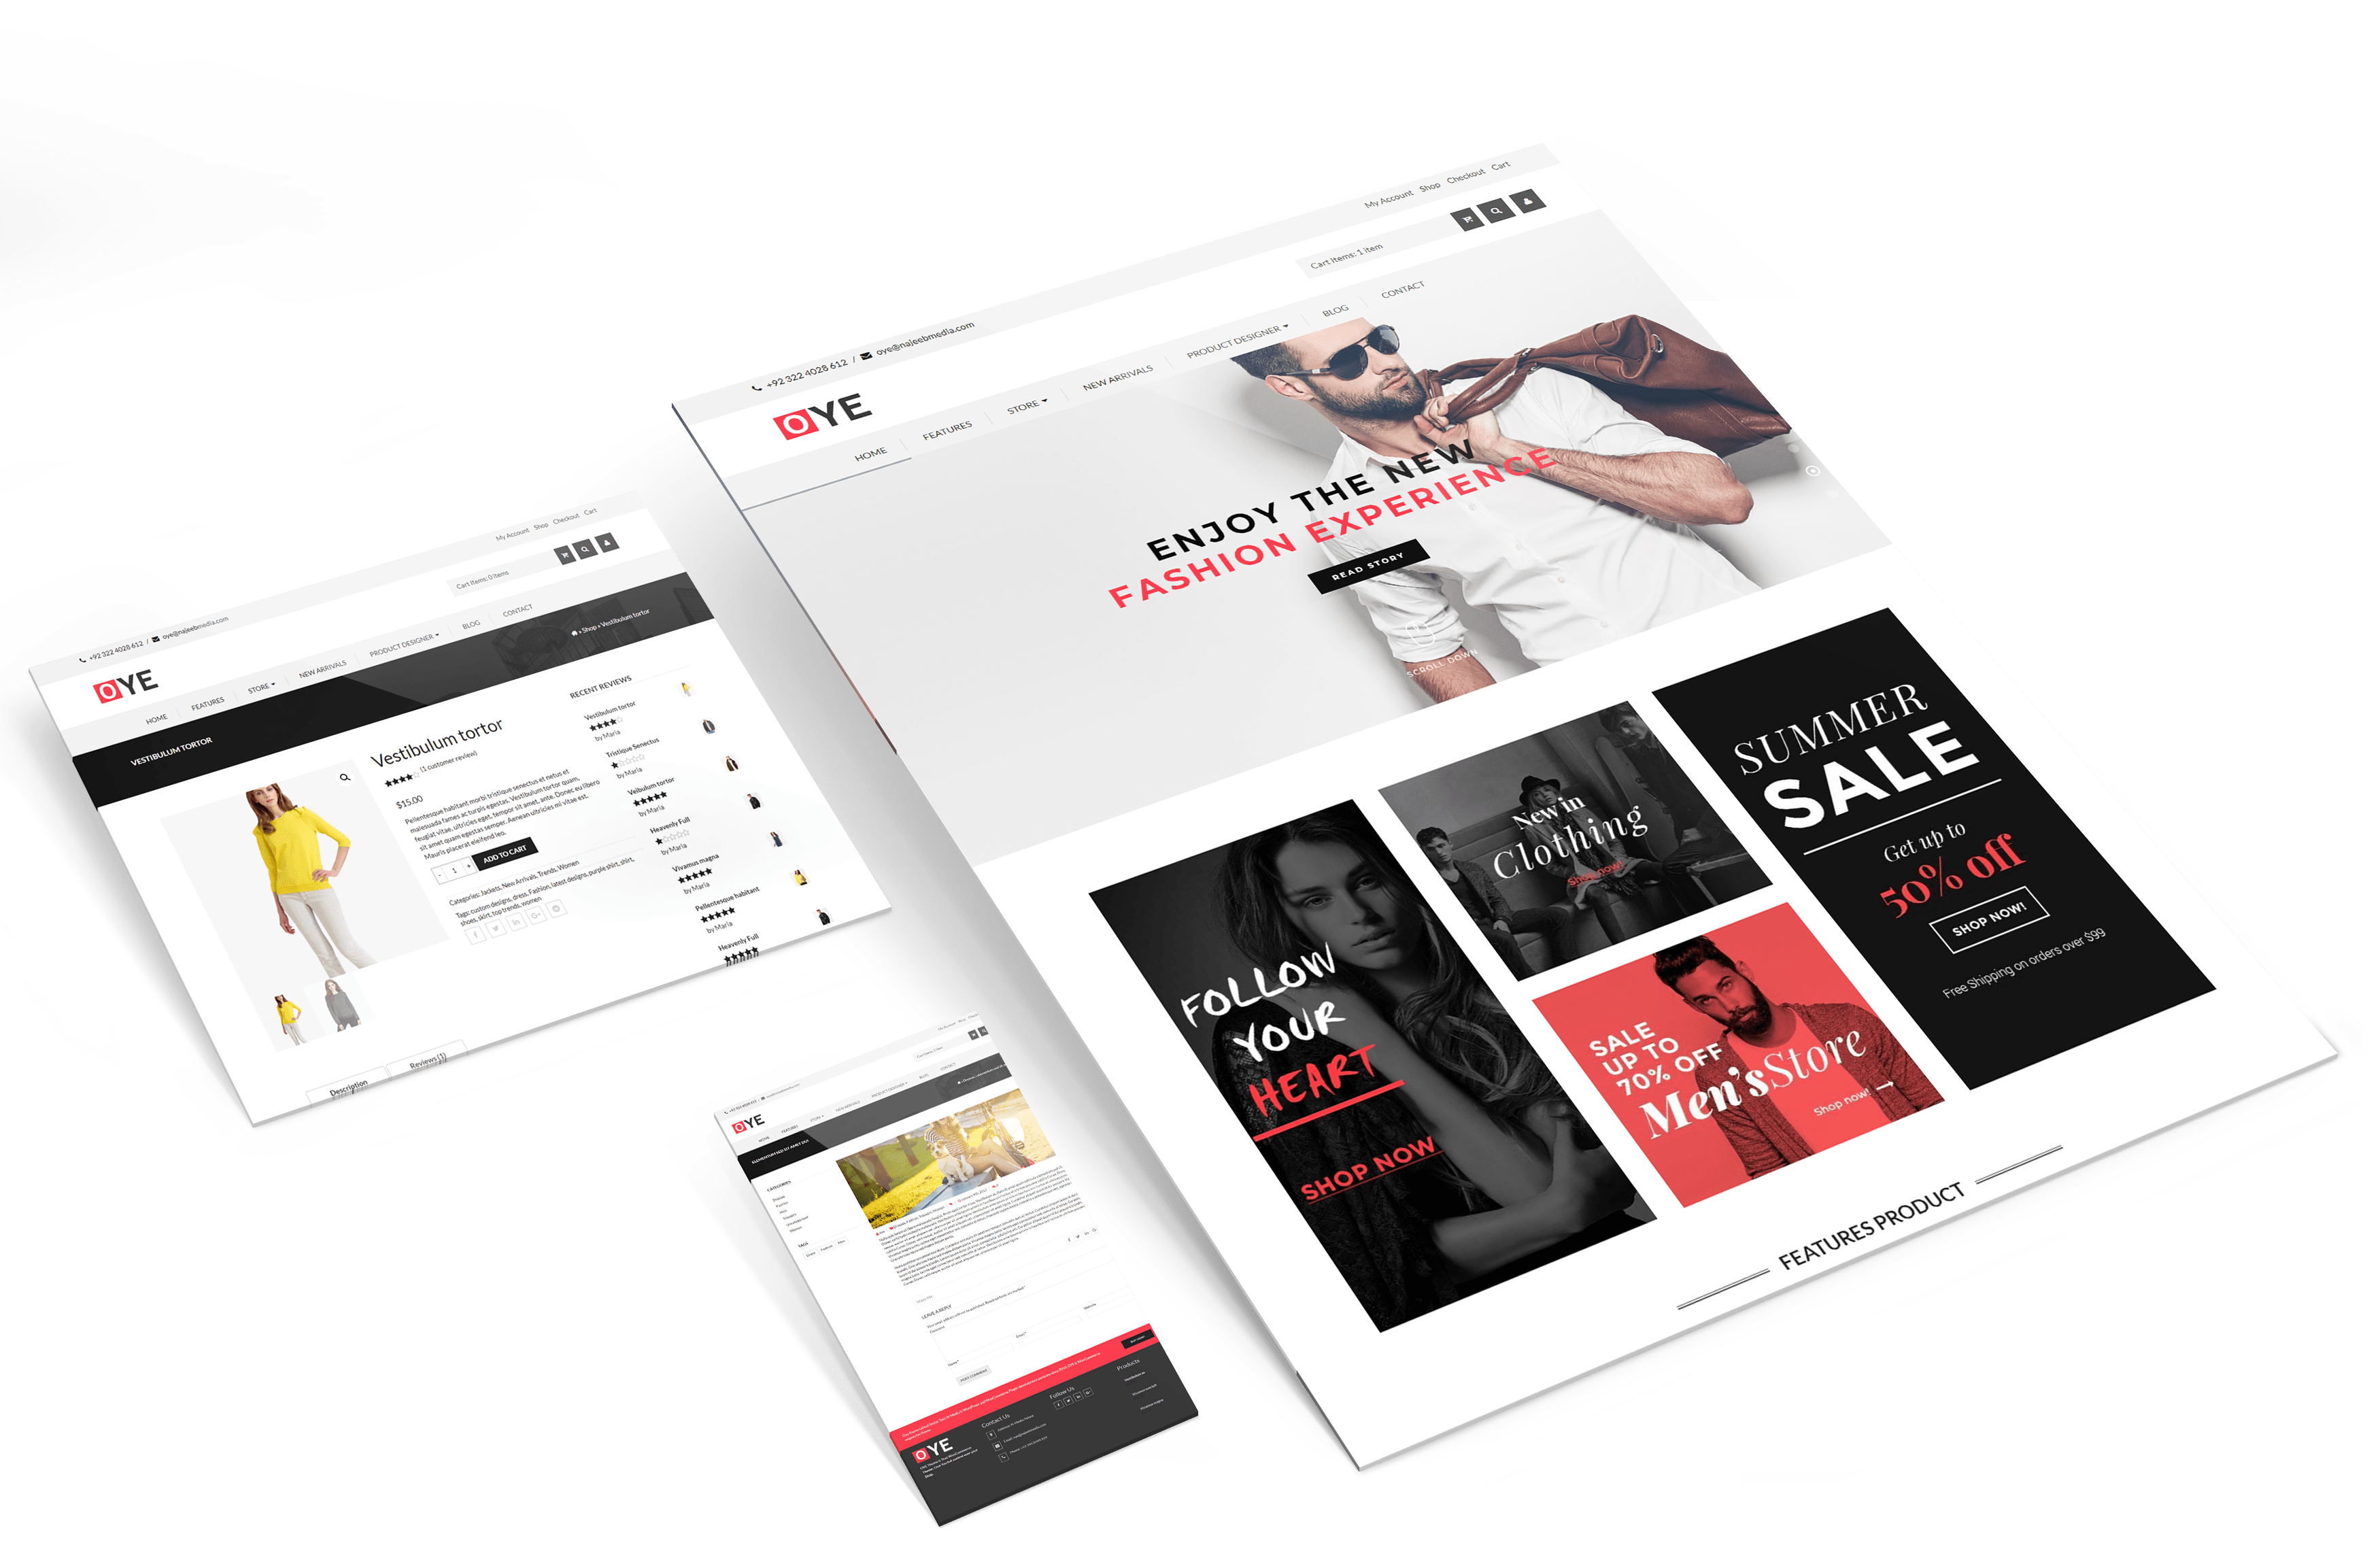 Siti web in prospettiva mockup | Web agency napoli flashex